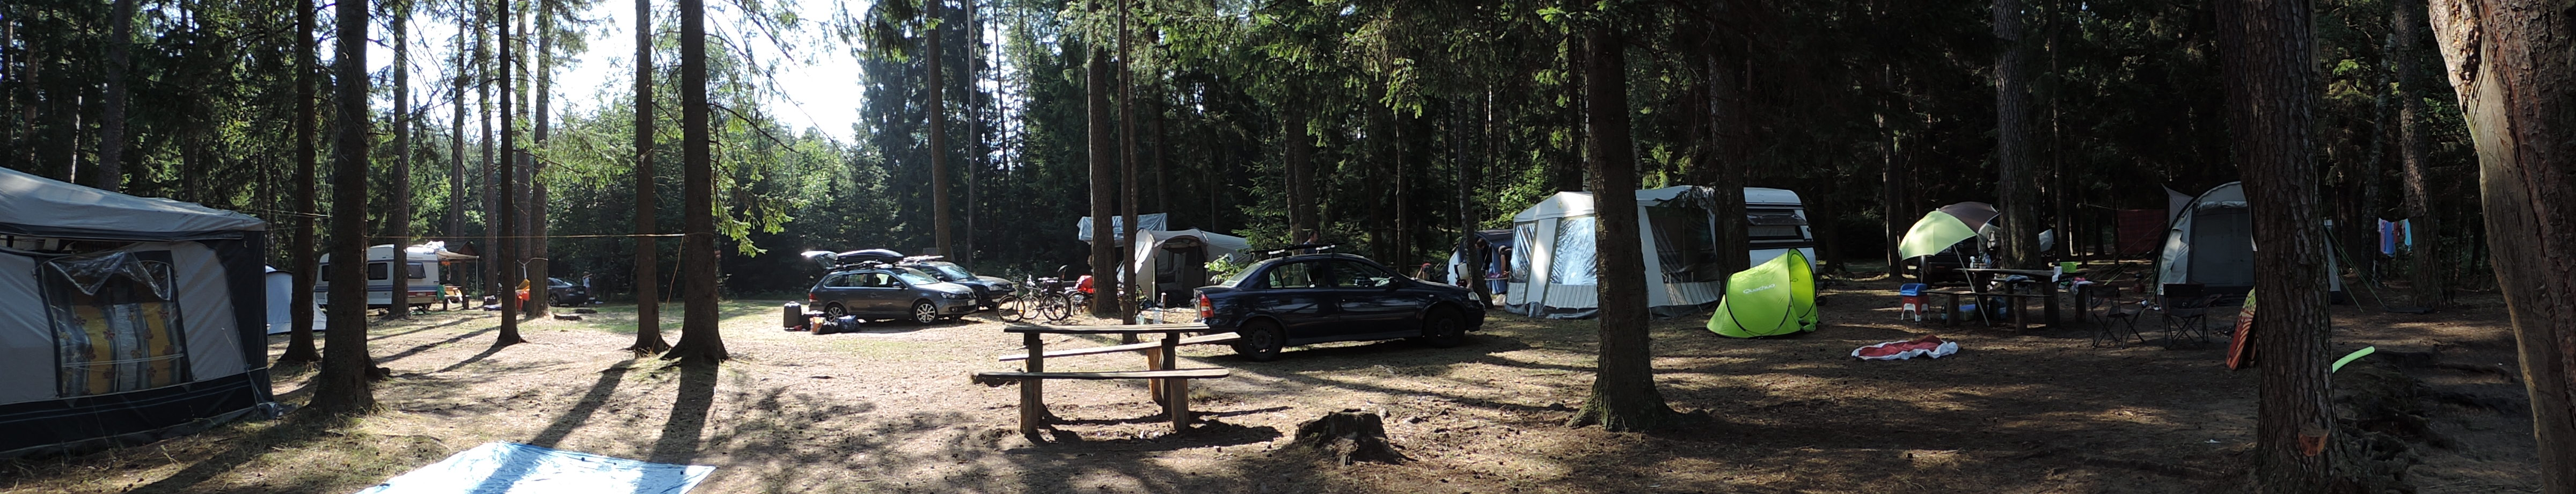 Sucha Rzeczka Camping - panorama